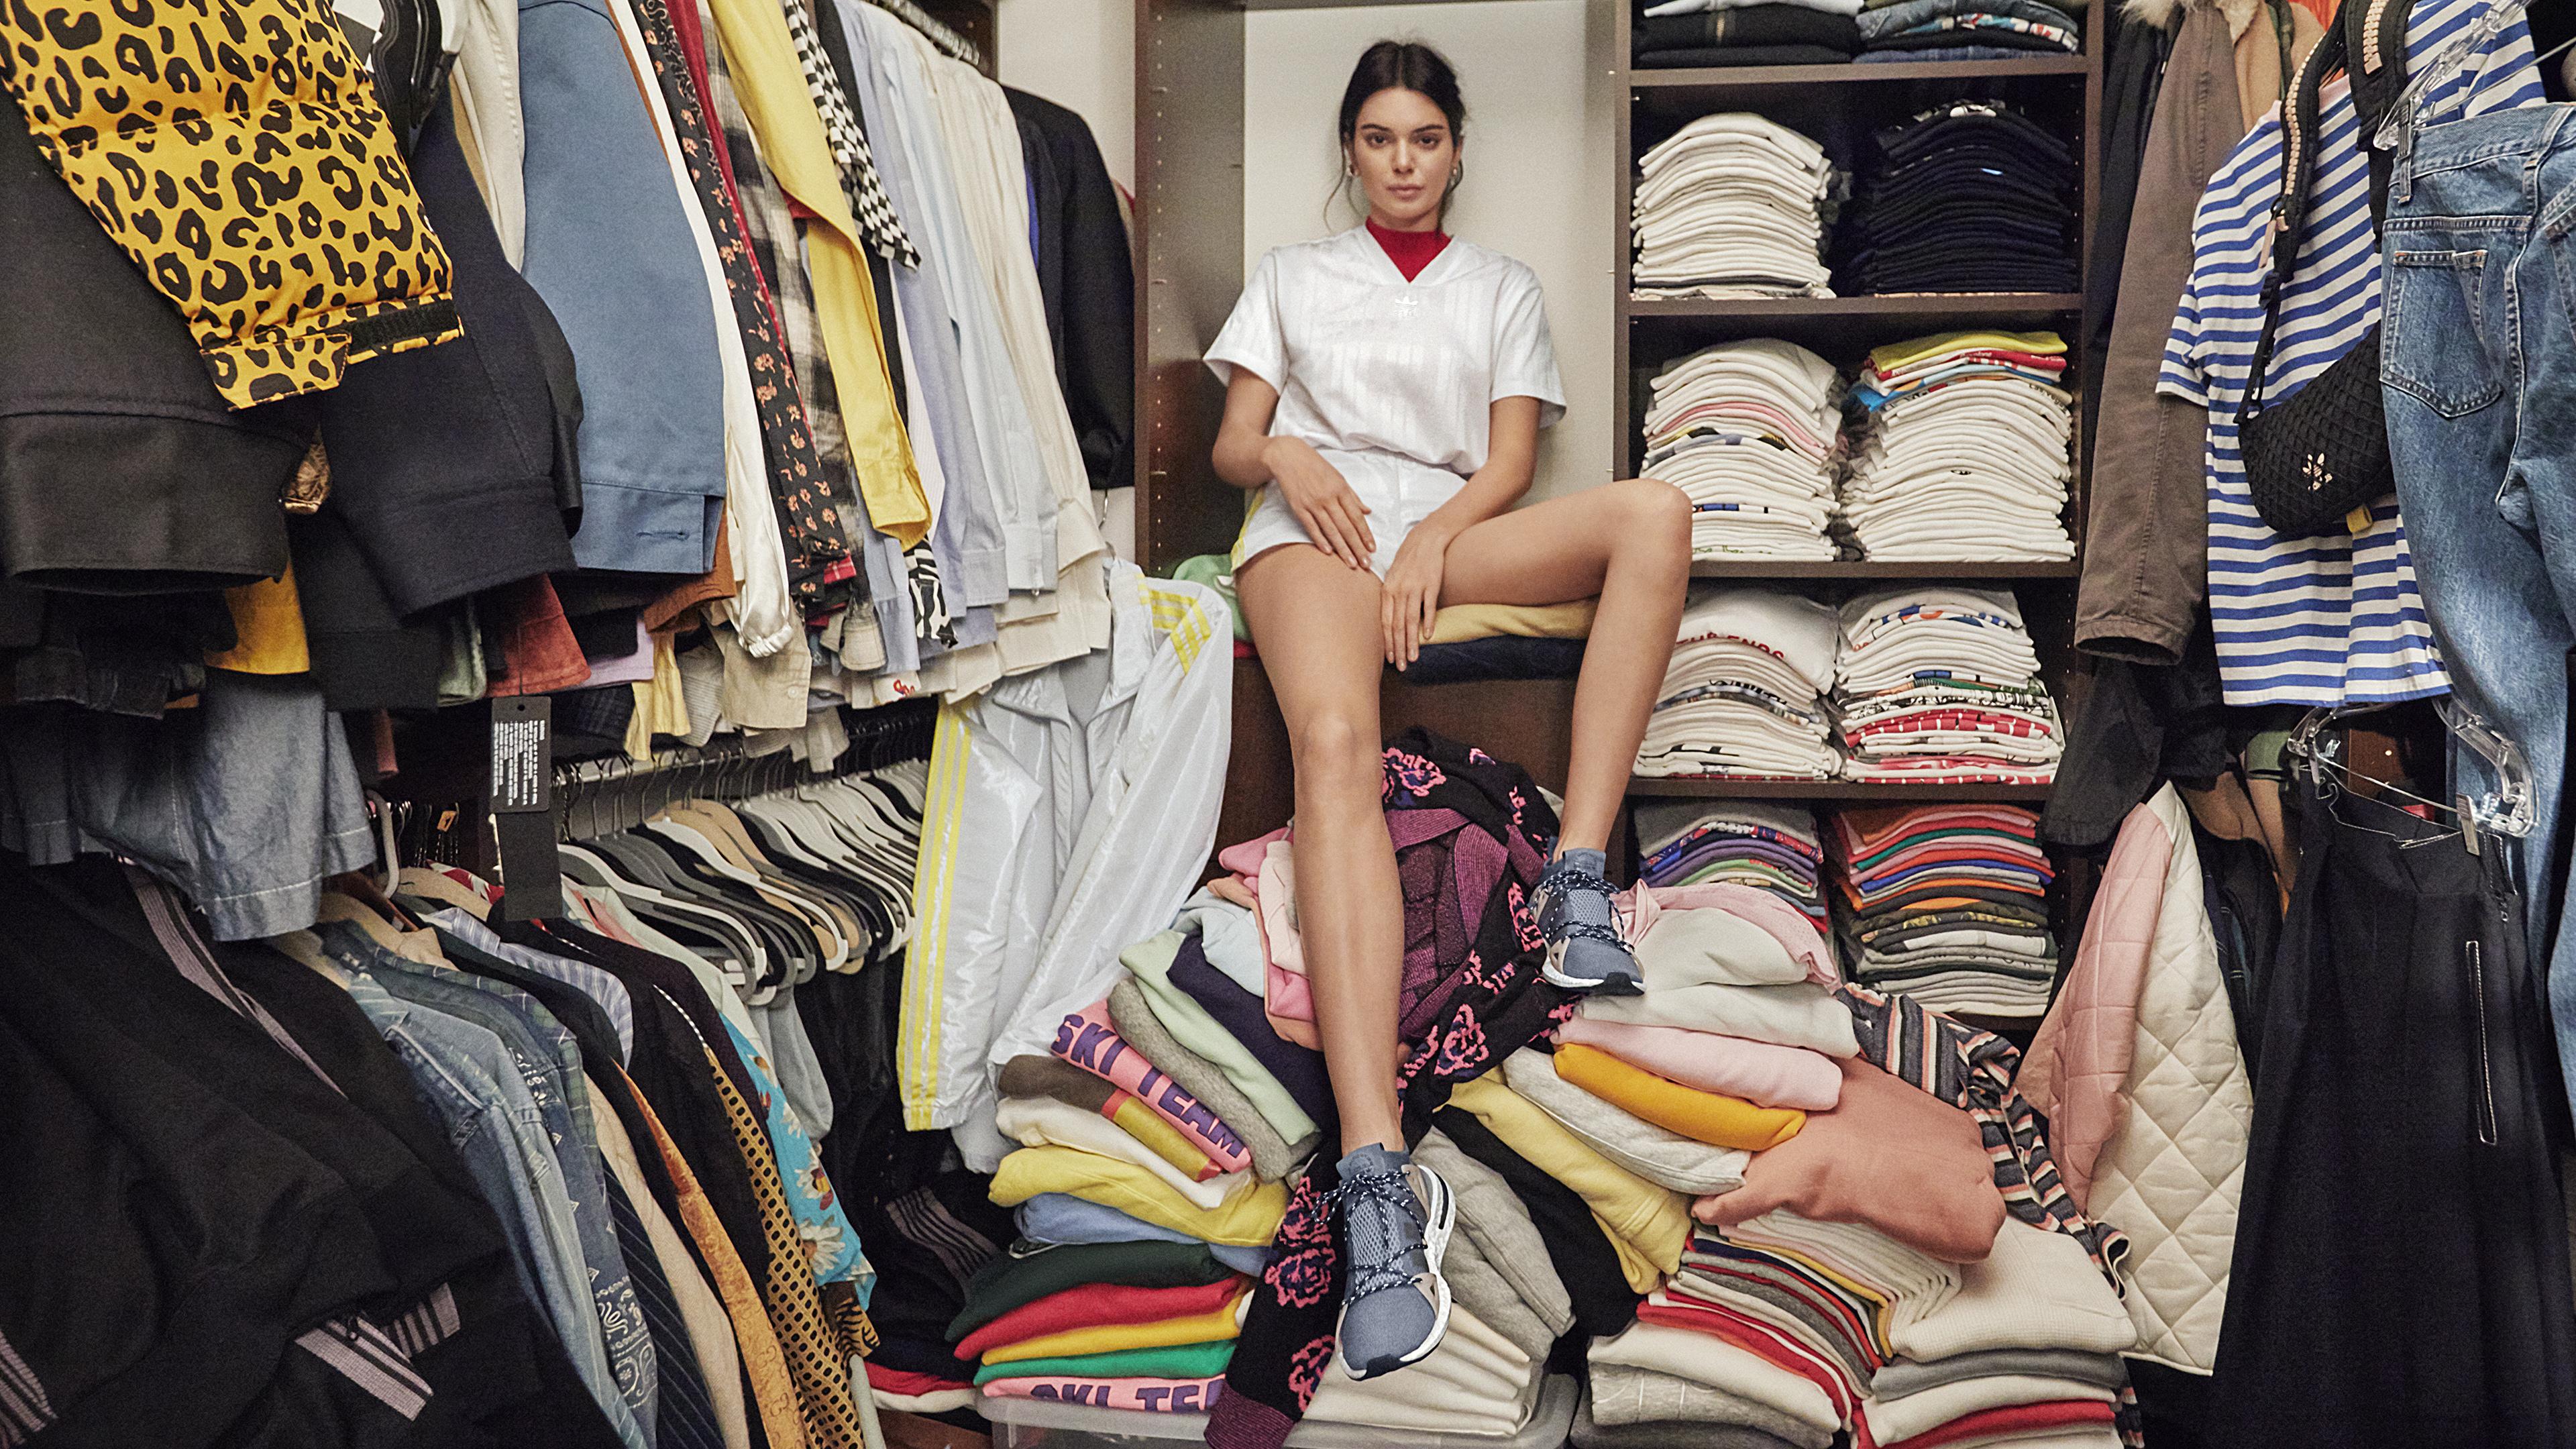 kendall jenner adidas 2019 4k 1536944586 - Kendall Jenner Adidas 2019 4k - model wallpapers, kendall jenner wallpapers, hd-wallpapers, girls wallpapers, celebrities wallpapers, adidas wallpapers, 4k-wallpapers